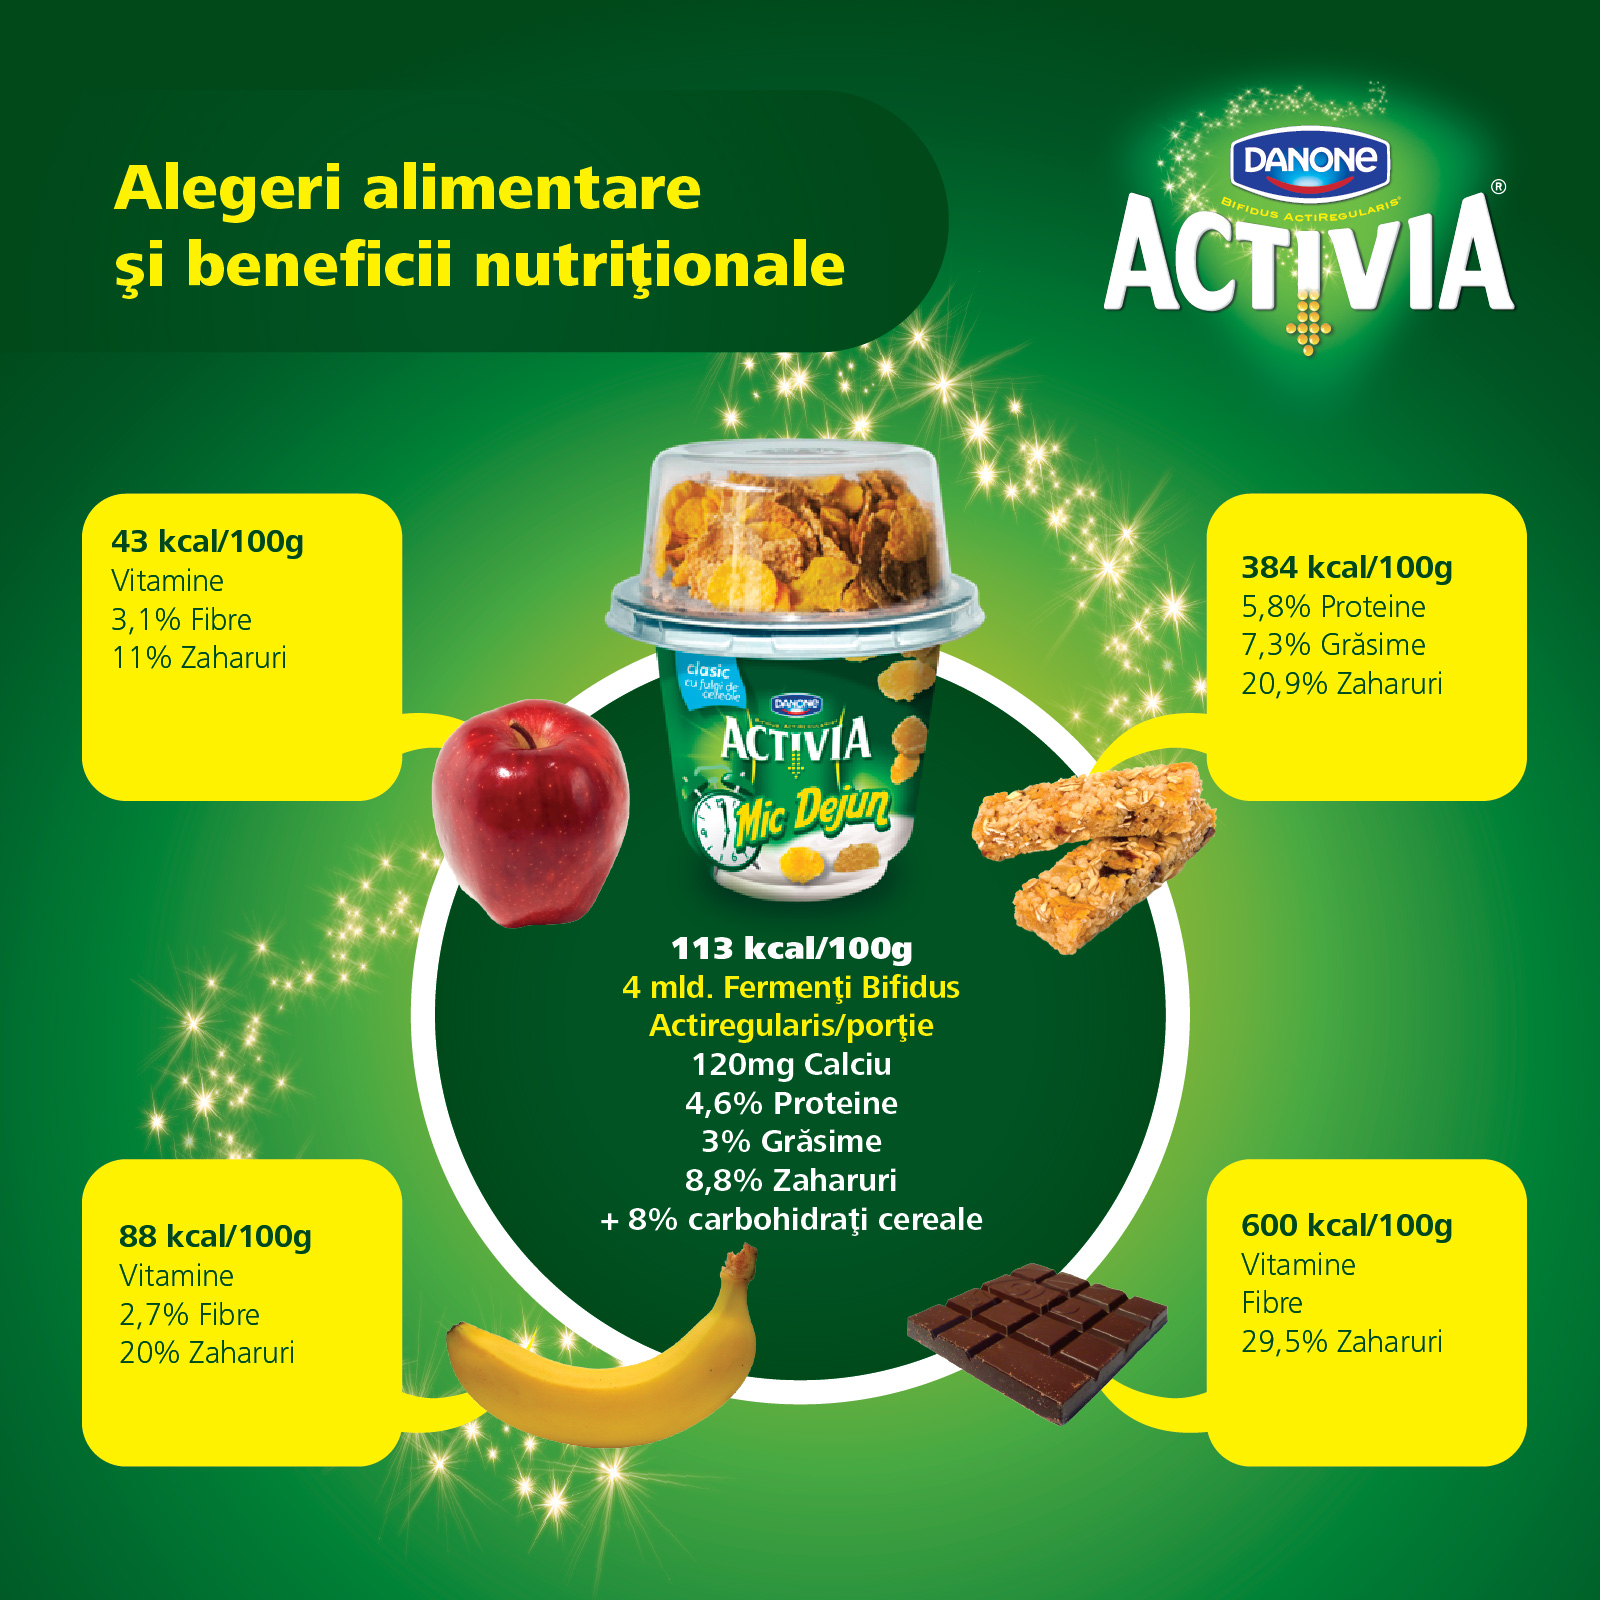 Alegeri alimentare si beneficii nutritionale